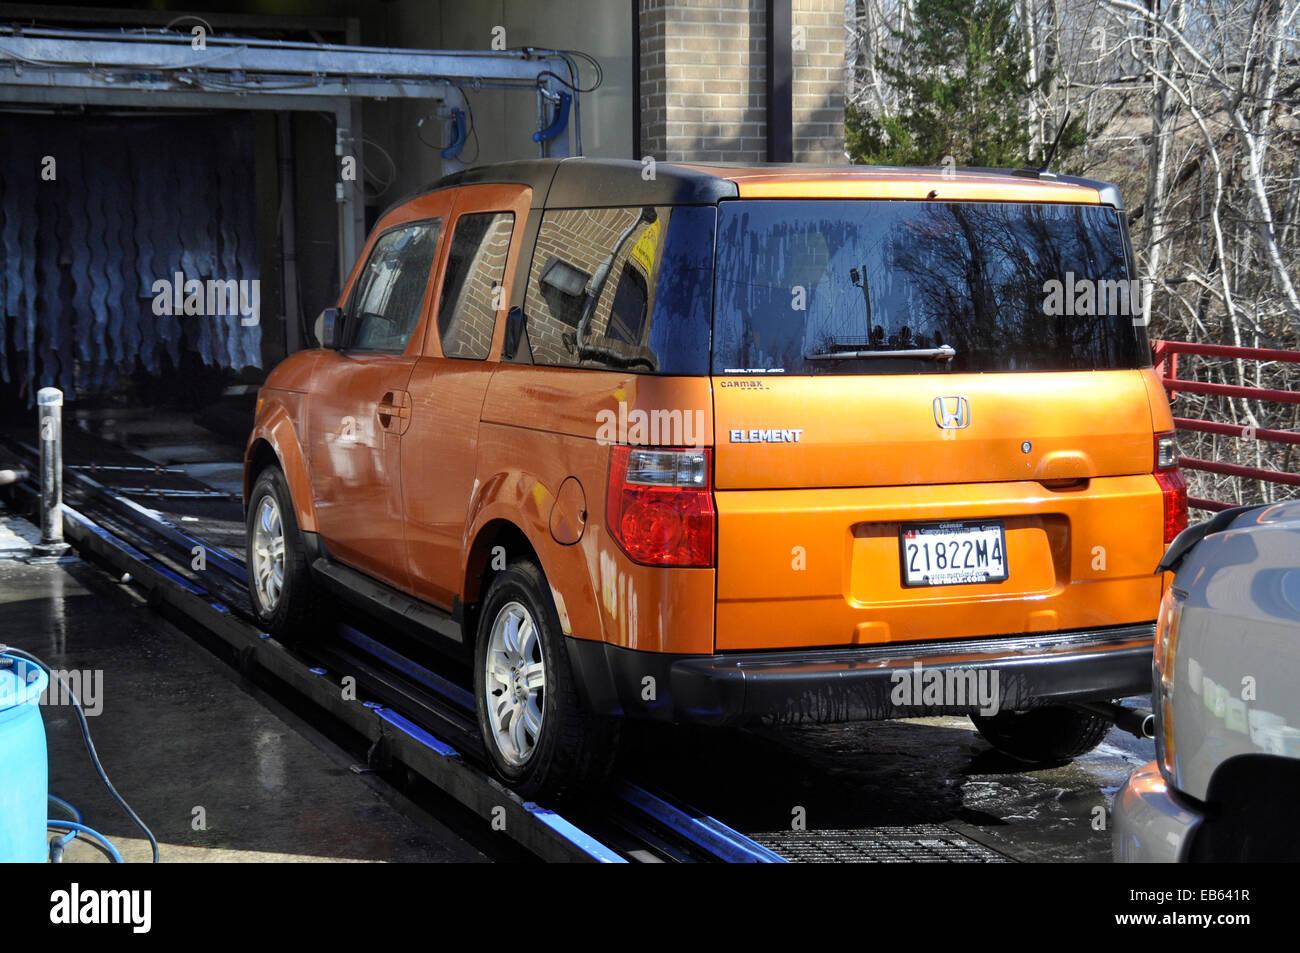 Honda Element at a car wash in Lahnam, Maryland - Stock Image